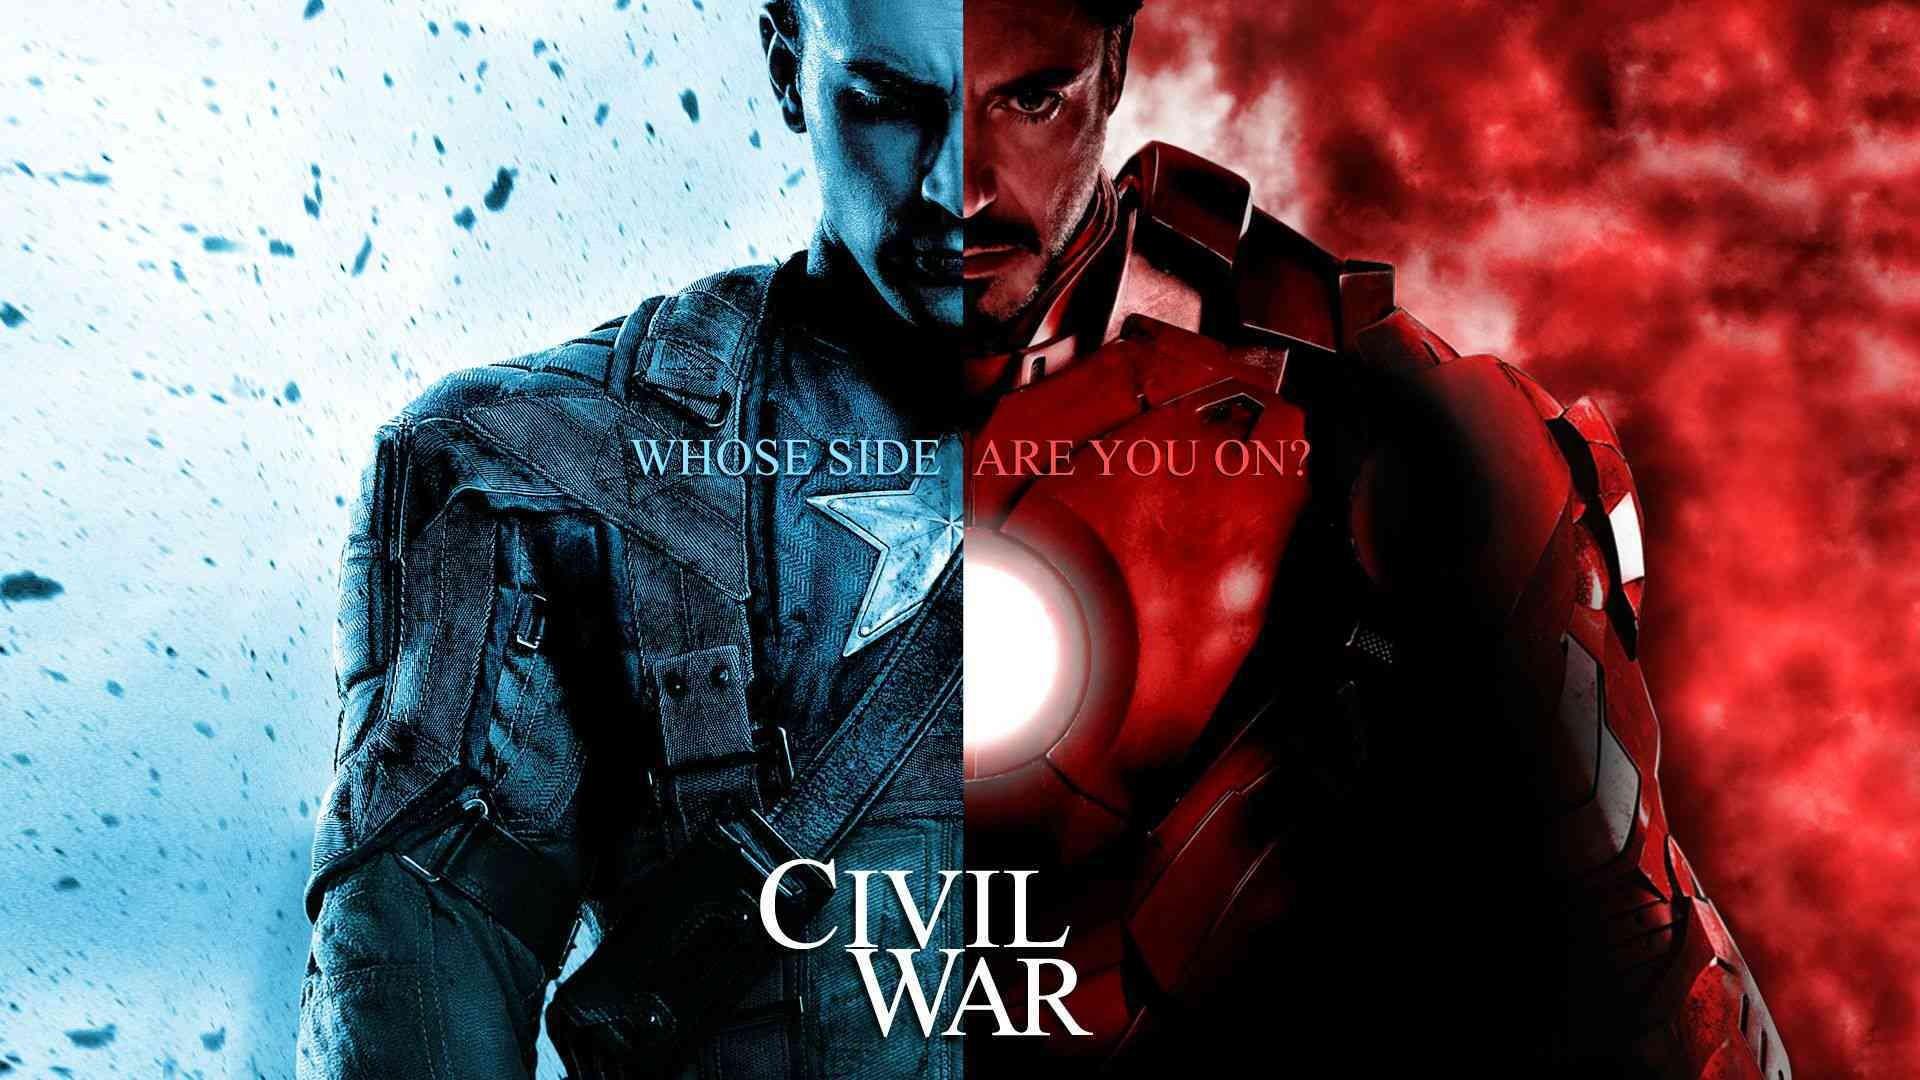 Wallpaper Movies Superhero Marvel Comics Iron Man Captain